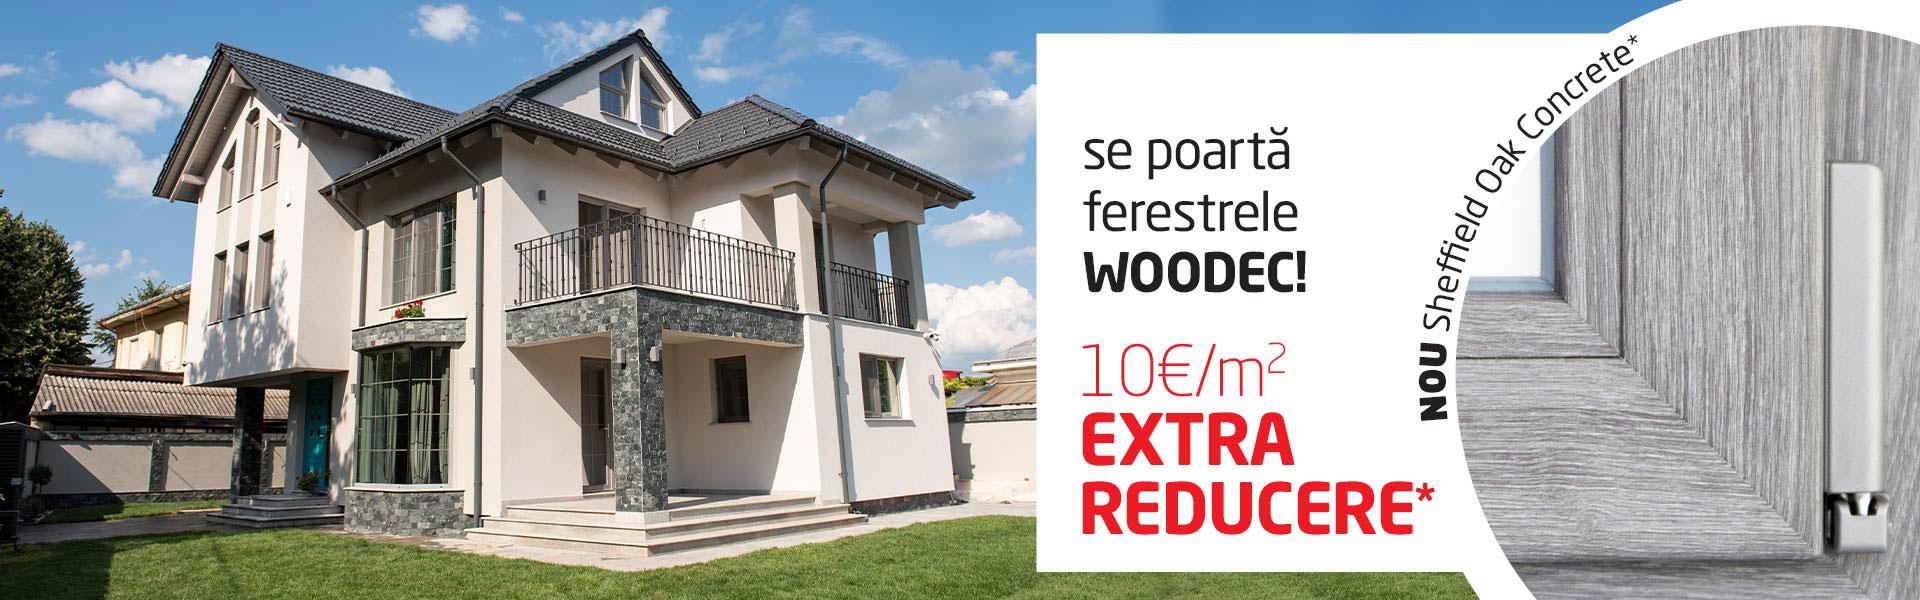 Termoplast reducere ferestre Woodec